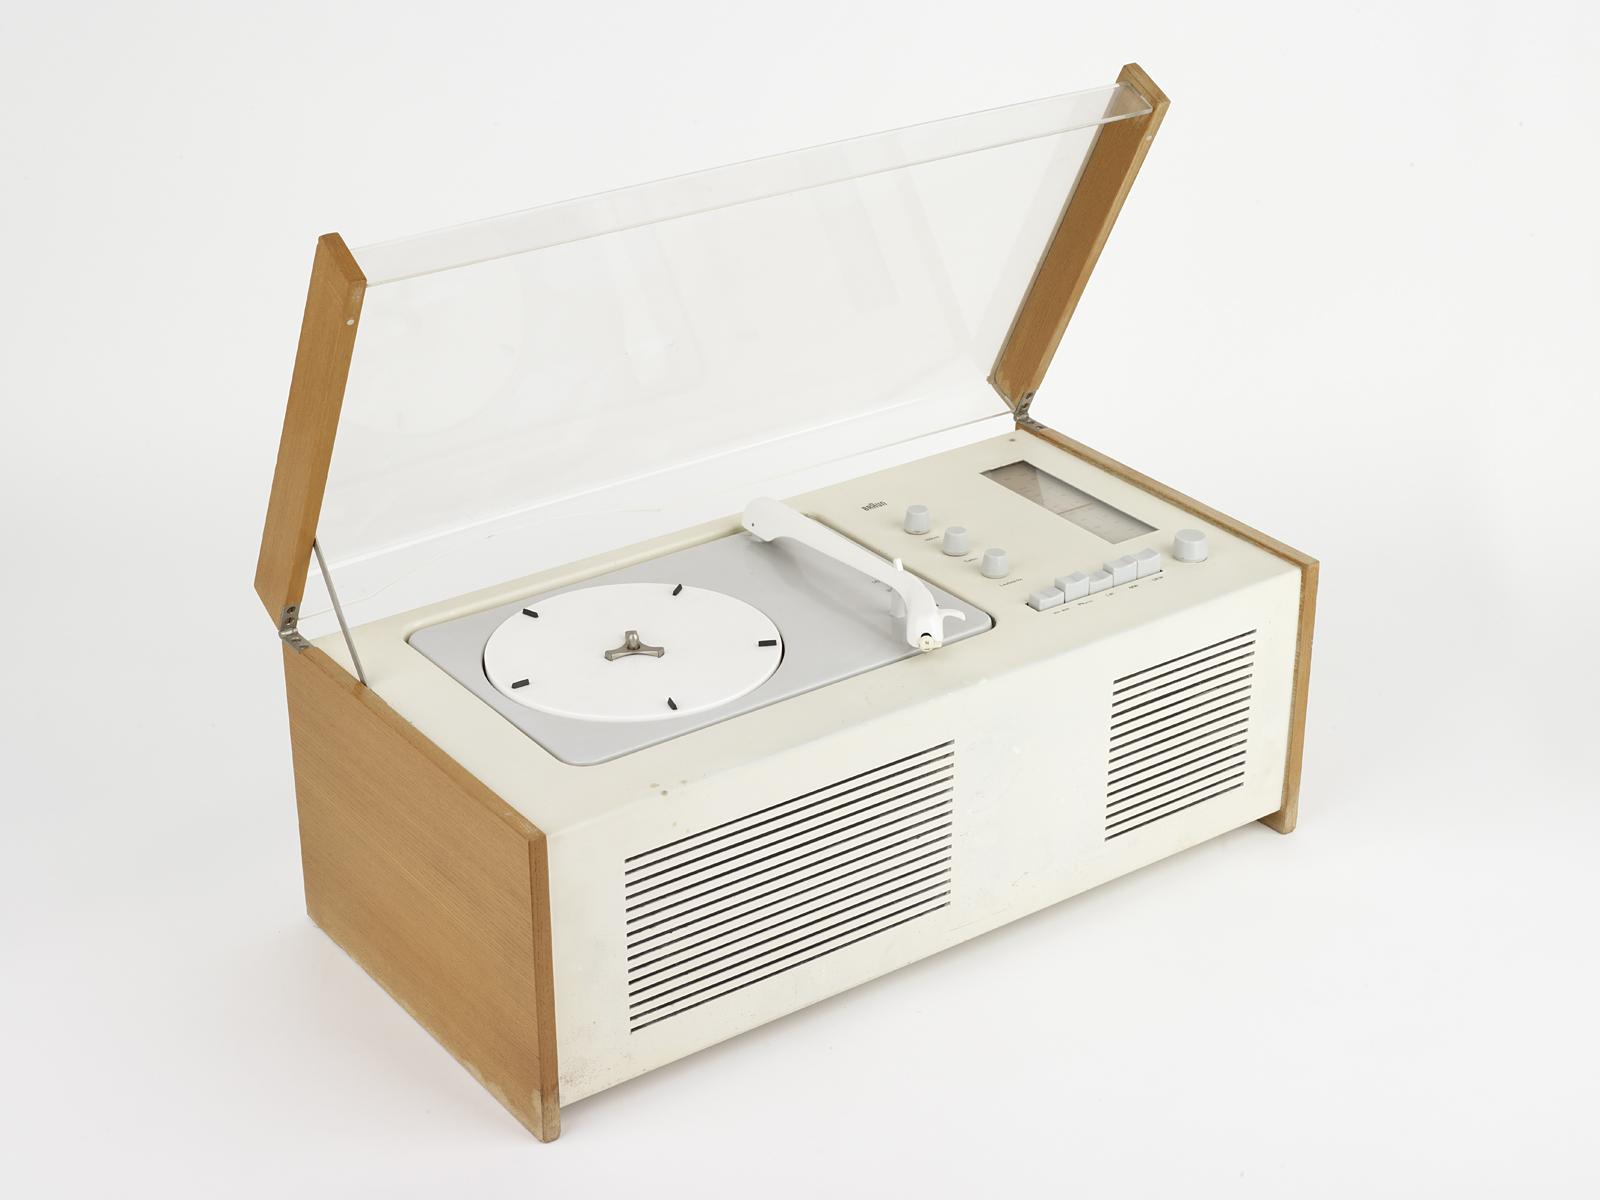 Design Museum, Adopt an Object, Phonosuper SK5, Year 1956, Designer Dieter Rams